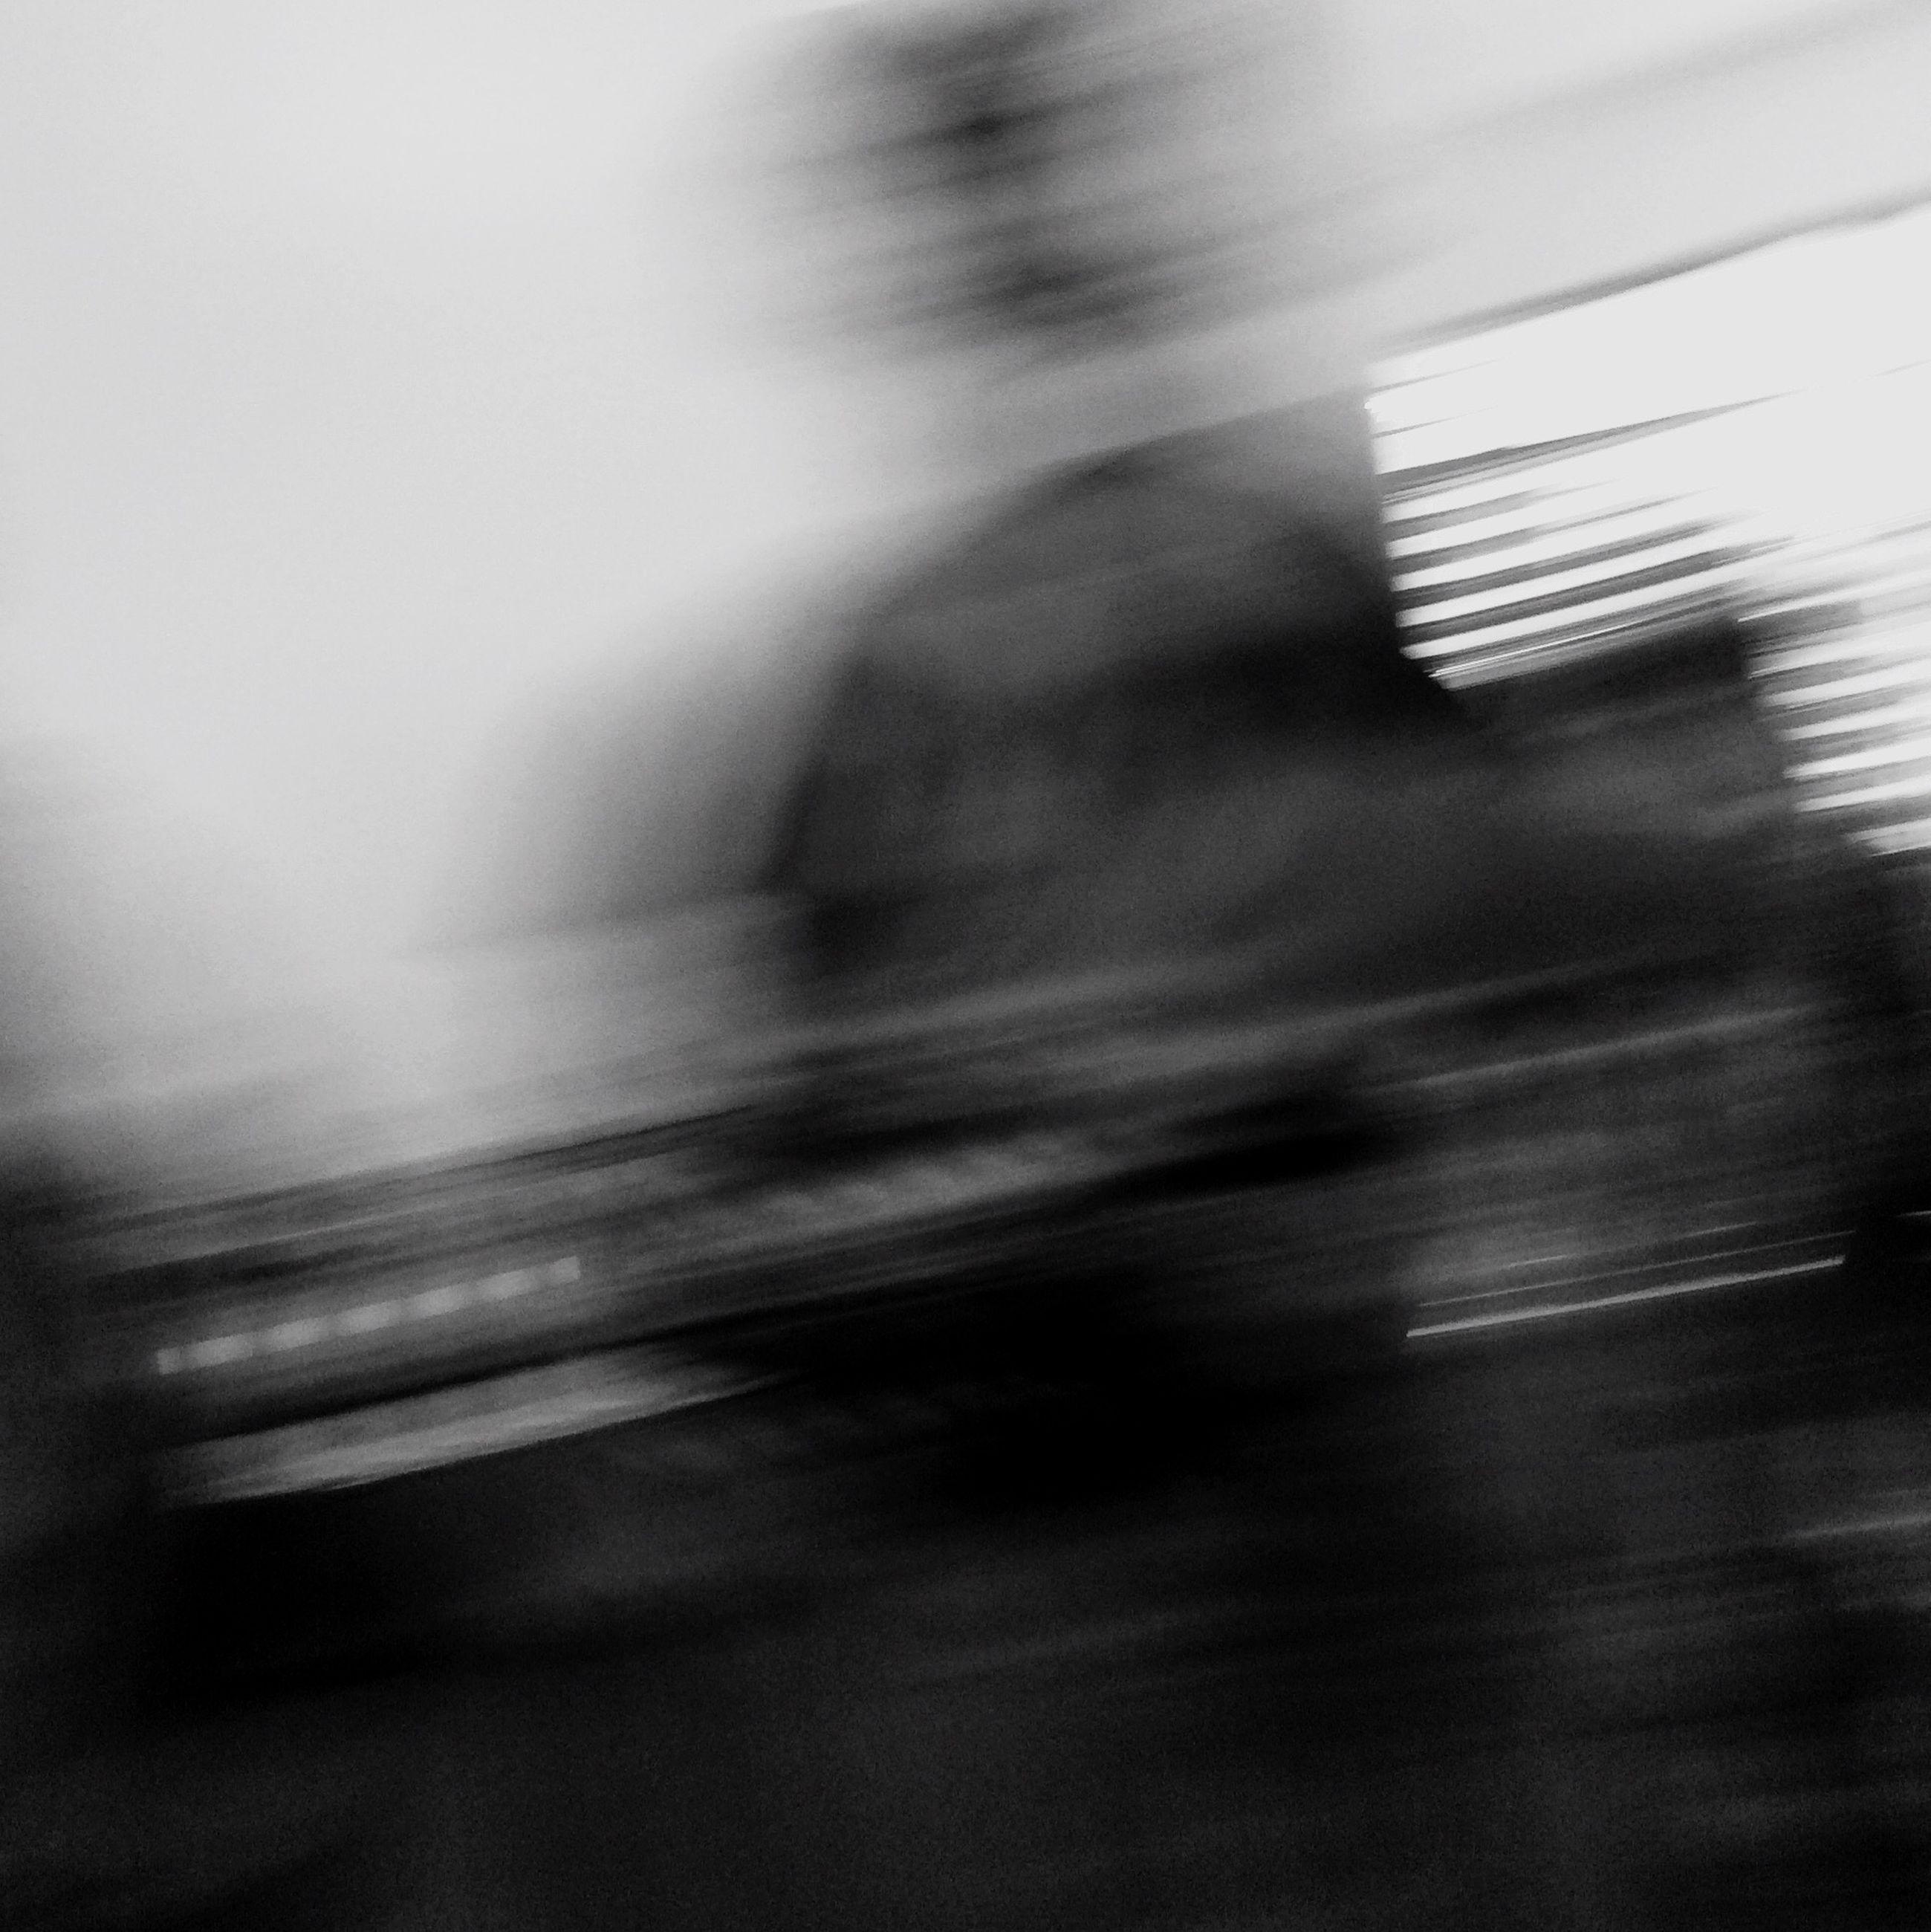 blurred motion, motion, indoors, transportation, long exposure, speed, blur, full frame, subway station, journey, no people